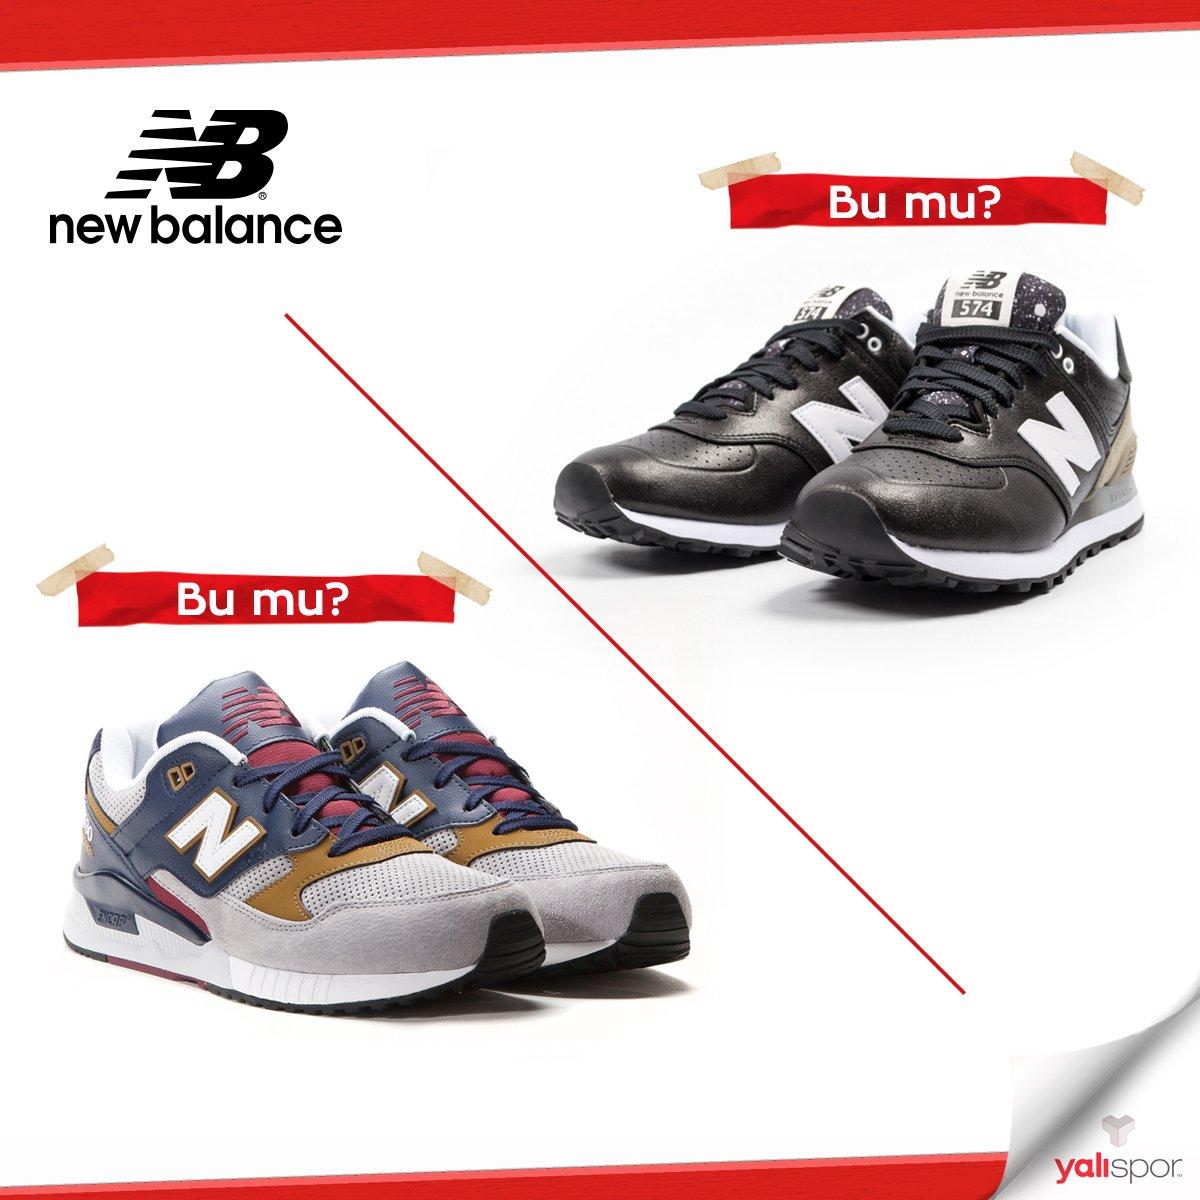 new balance 574 yorum